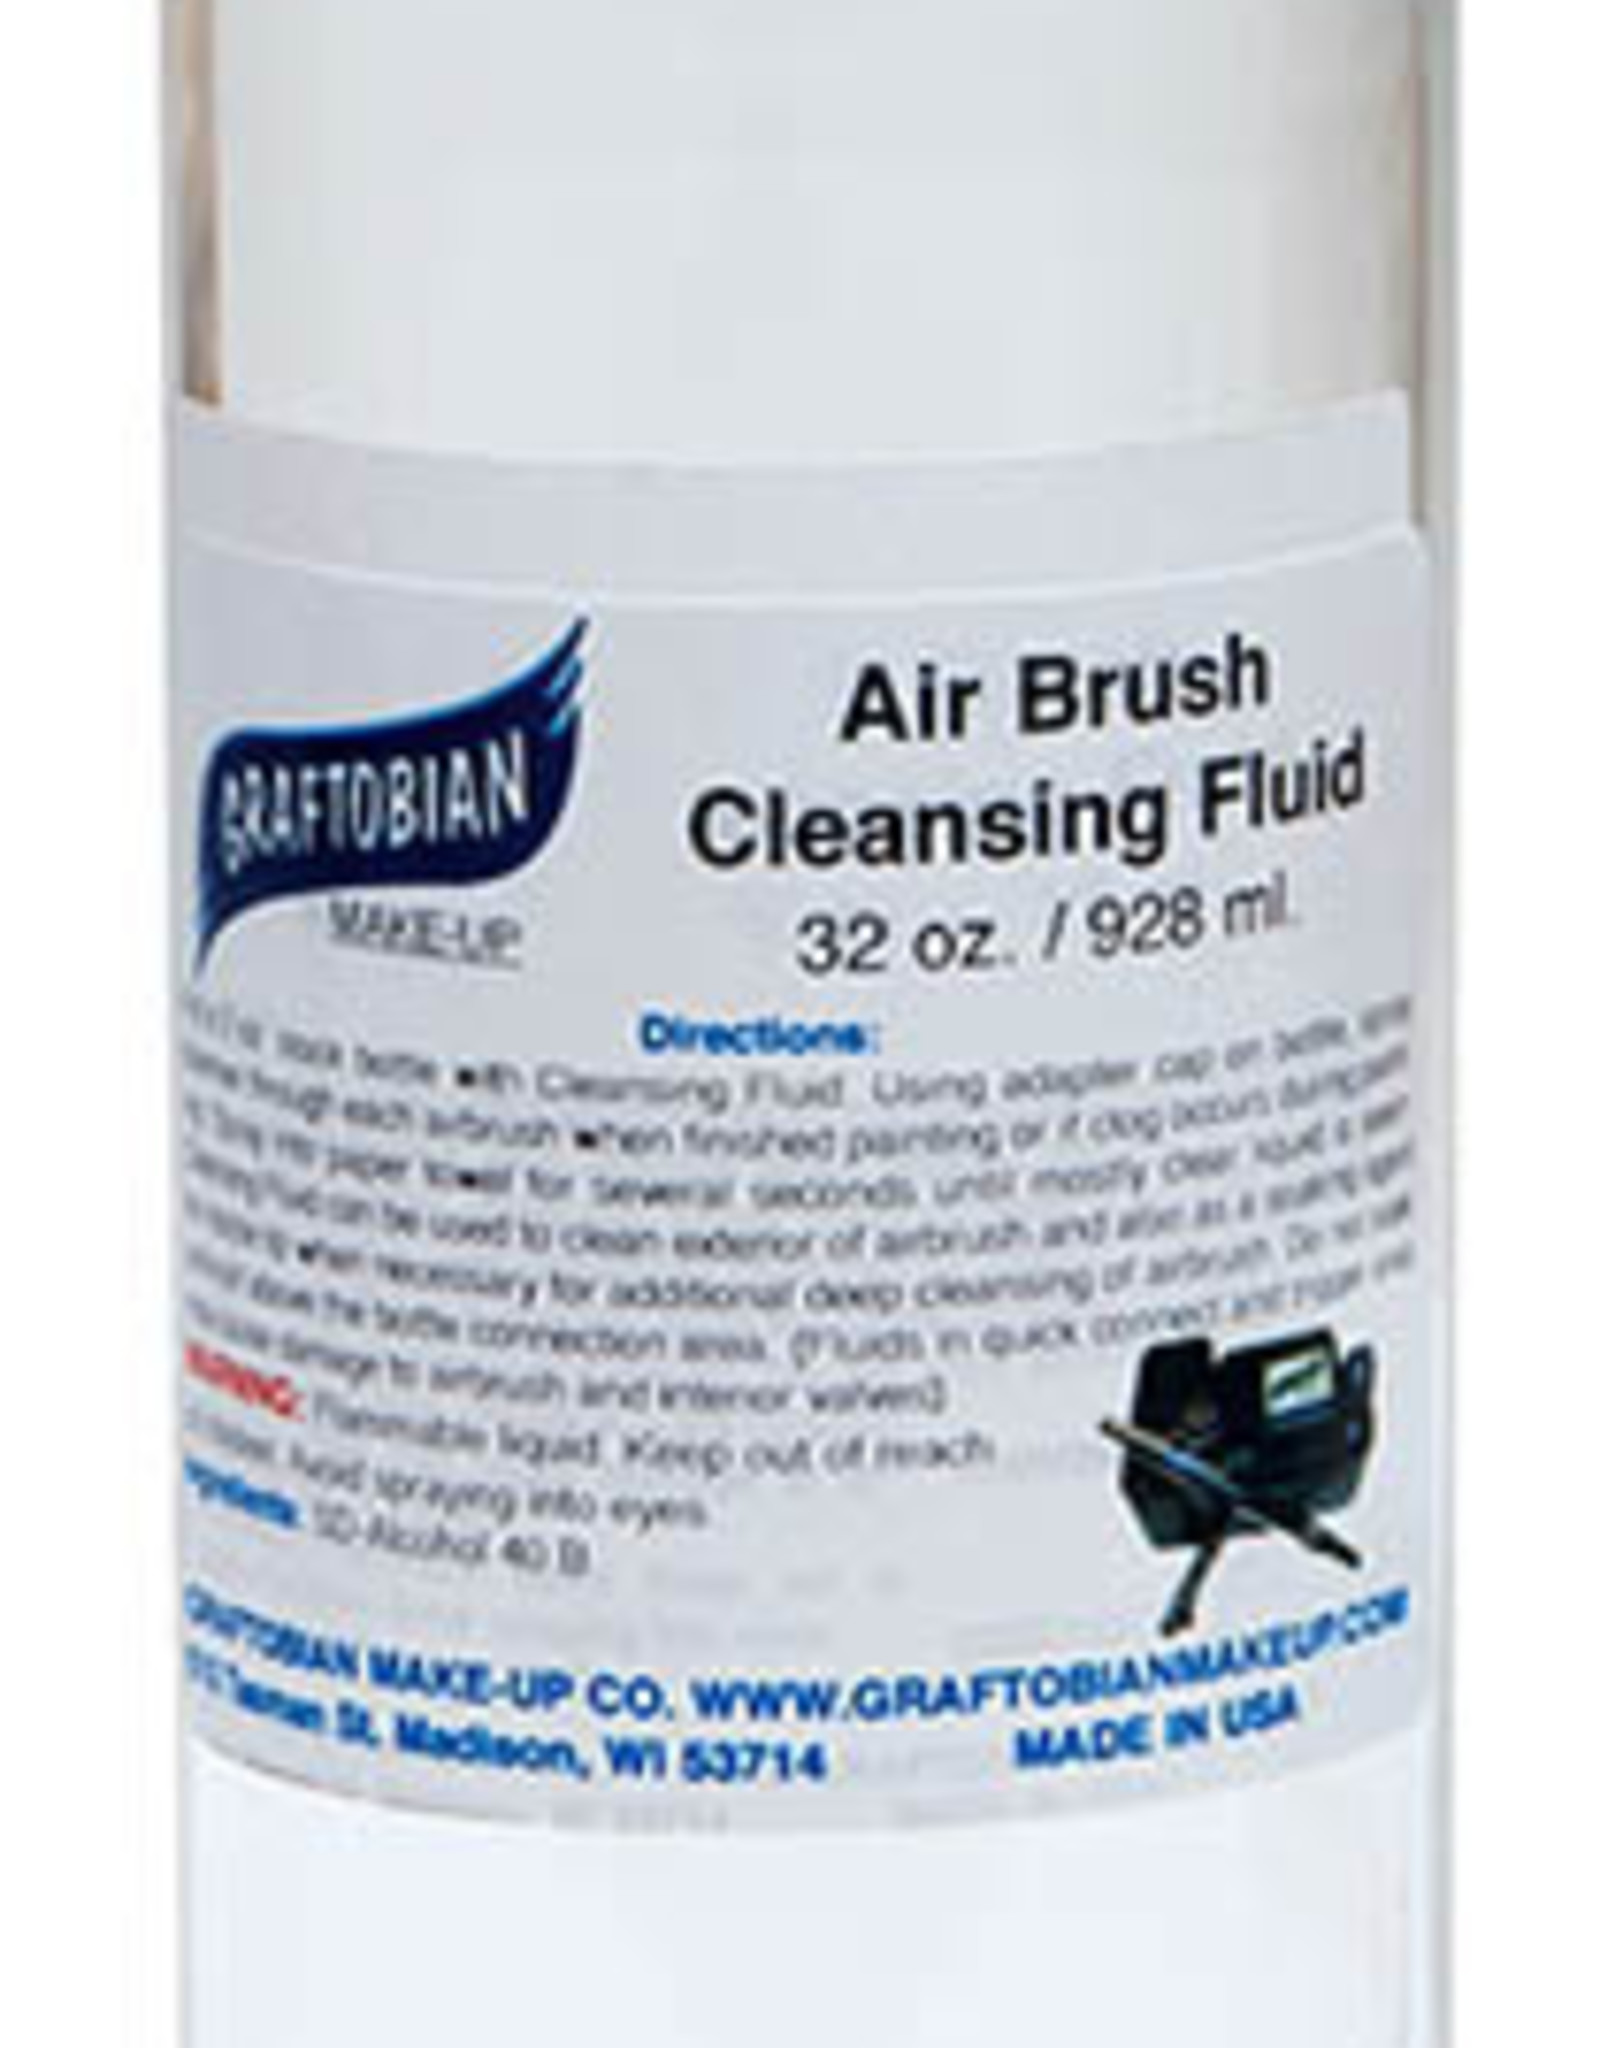 Air Brush Cleansing Fluid 32 oz